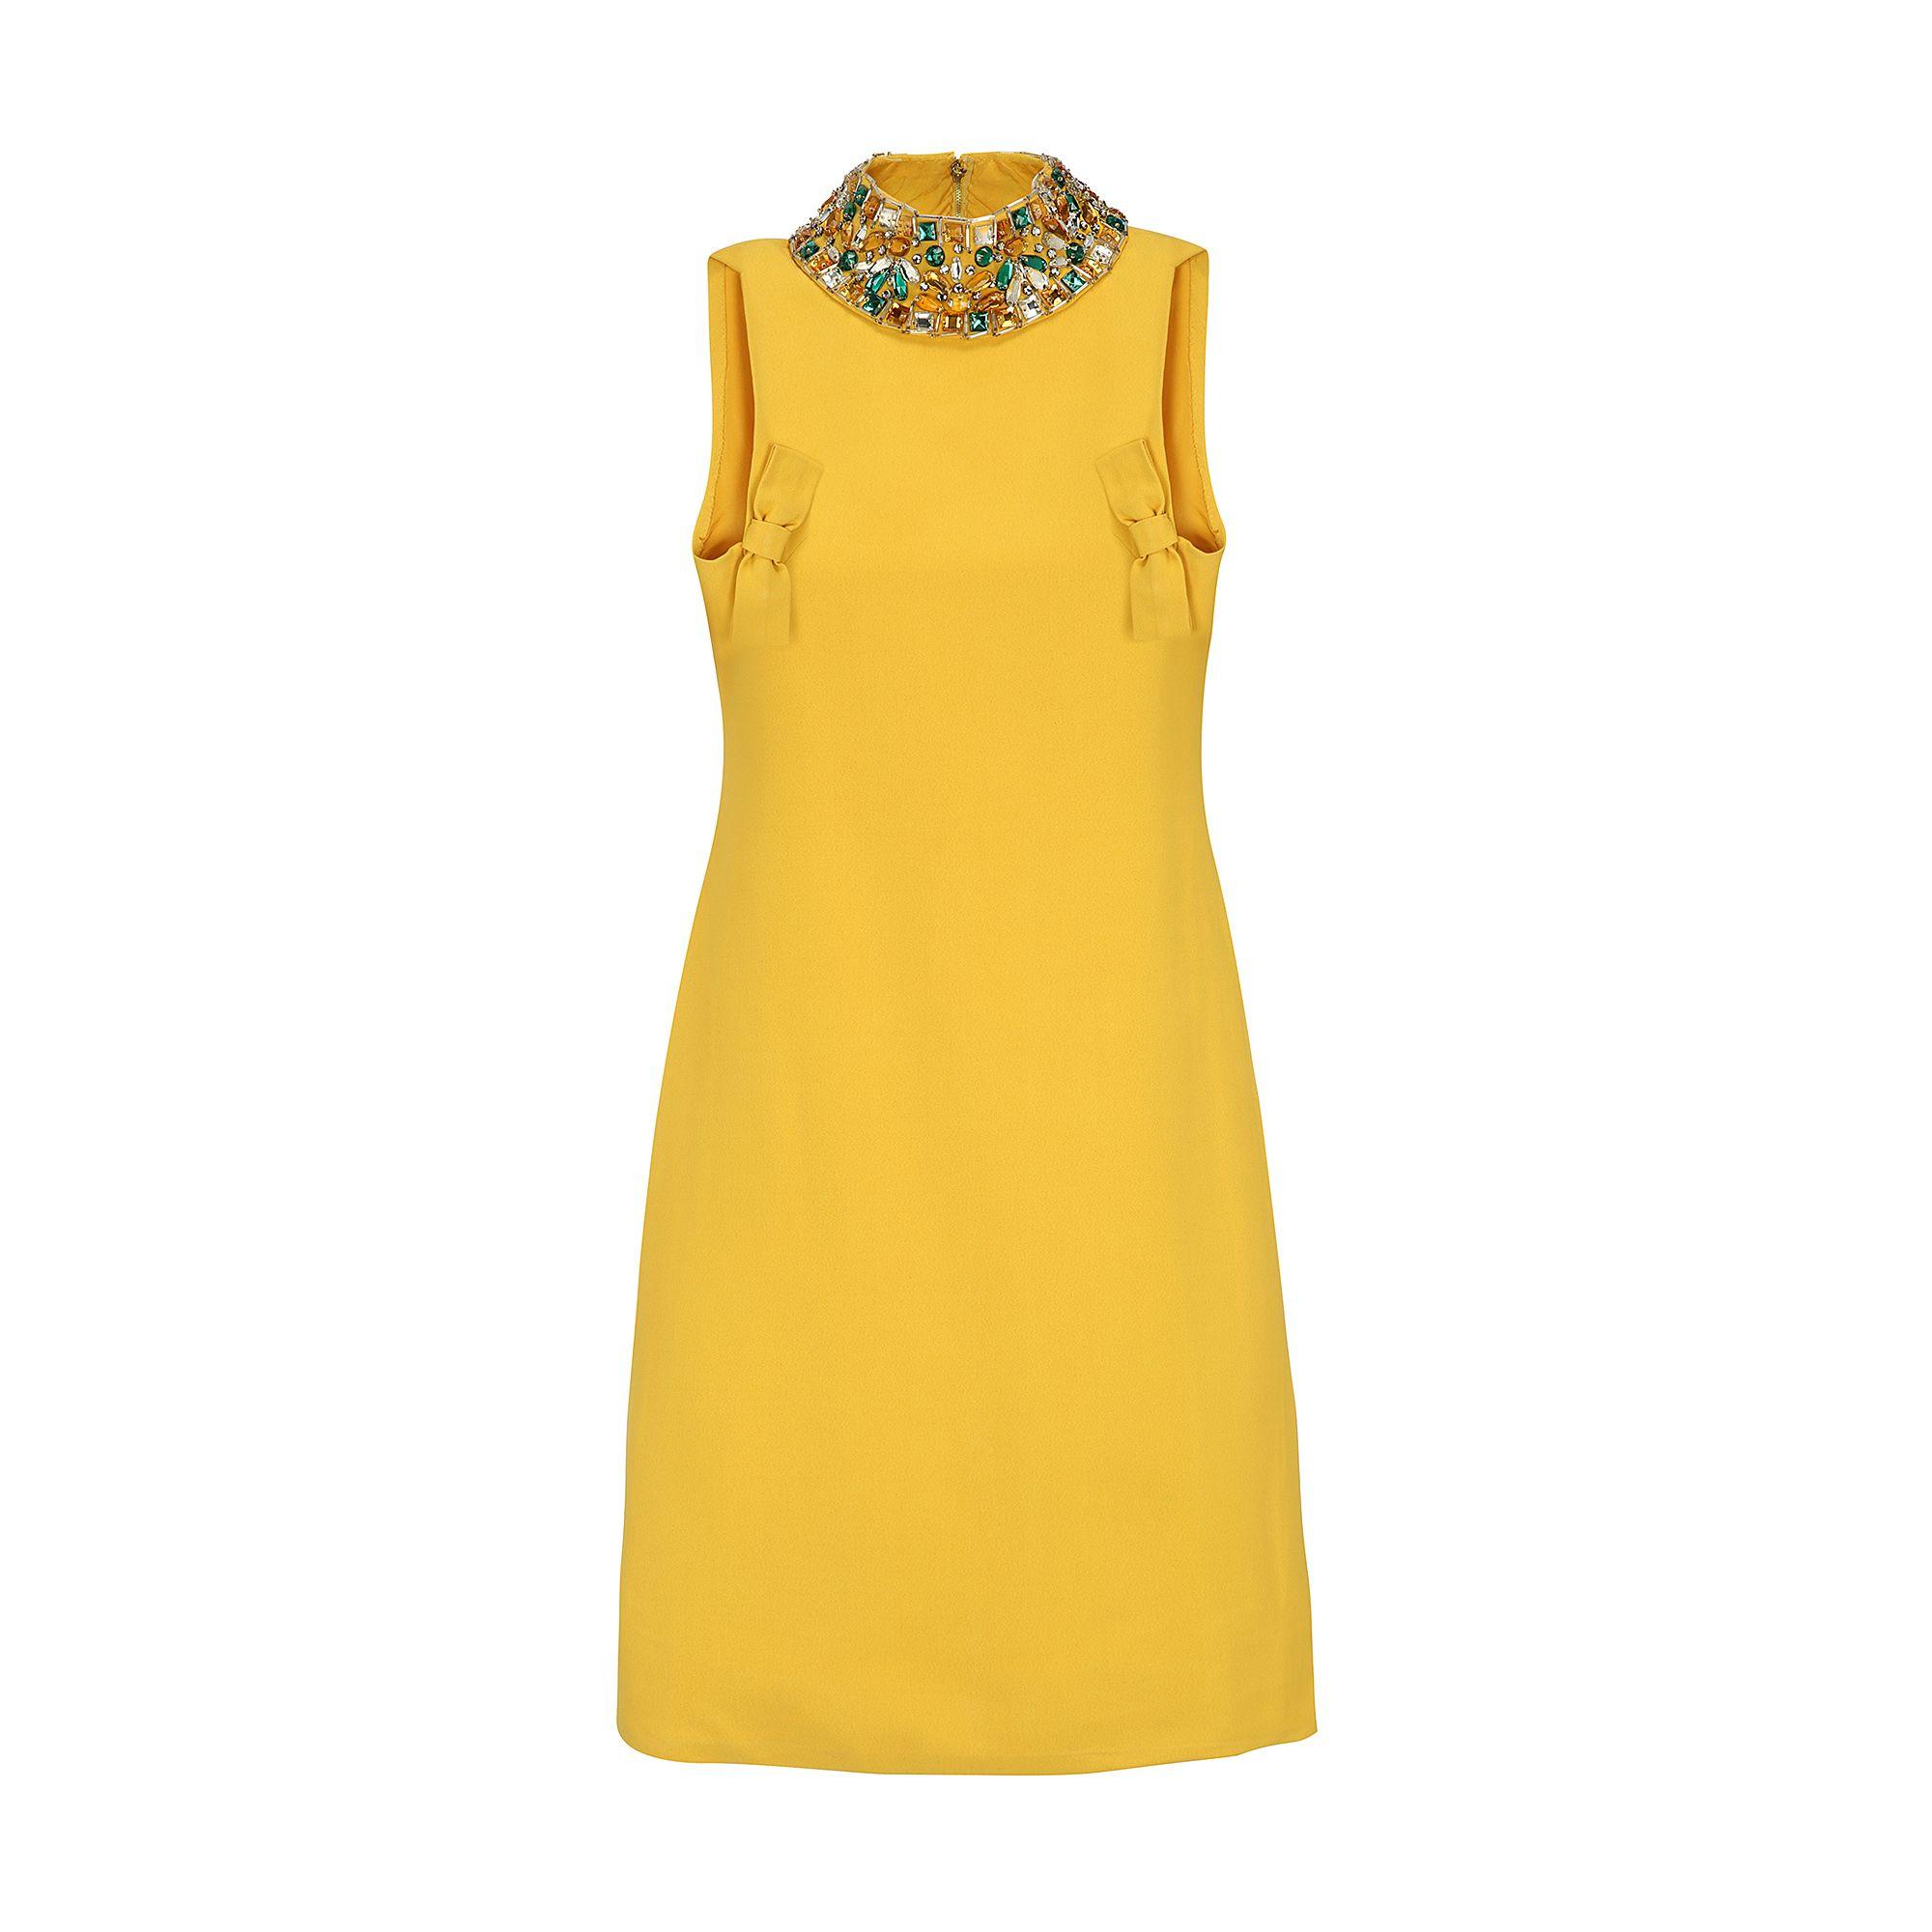 "<p><strong>La DoubleJ</strong> silk crepe dress, $460, <a href=""https://ladoublej.com/shop/dresses/silk-crepe-dress-1960s/"" target=""_blank"">ladoublej.com</a>. </p>"